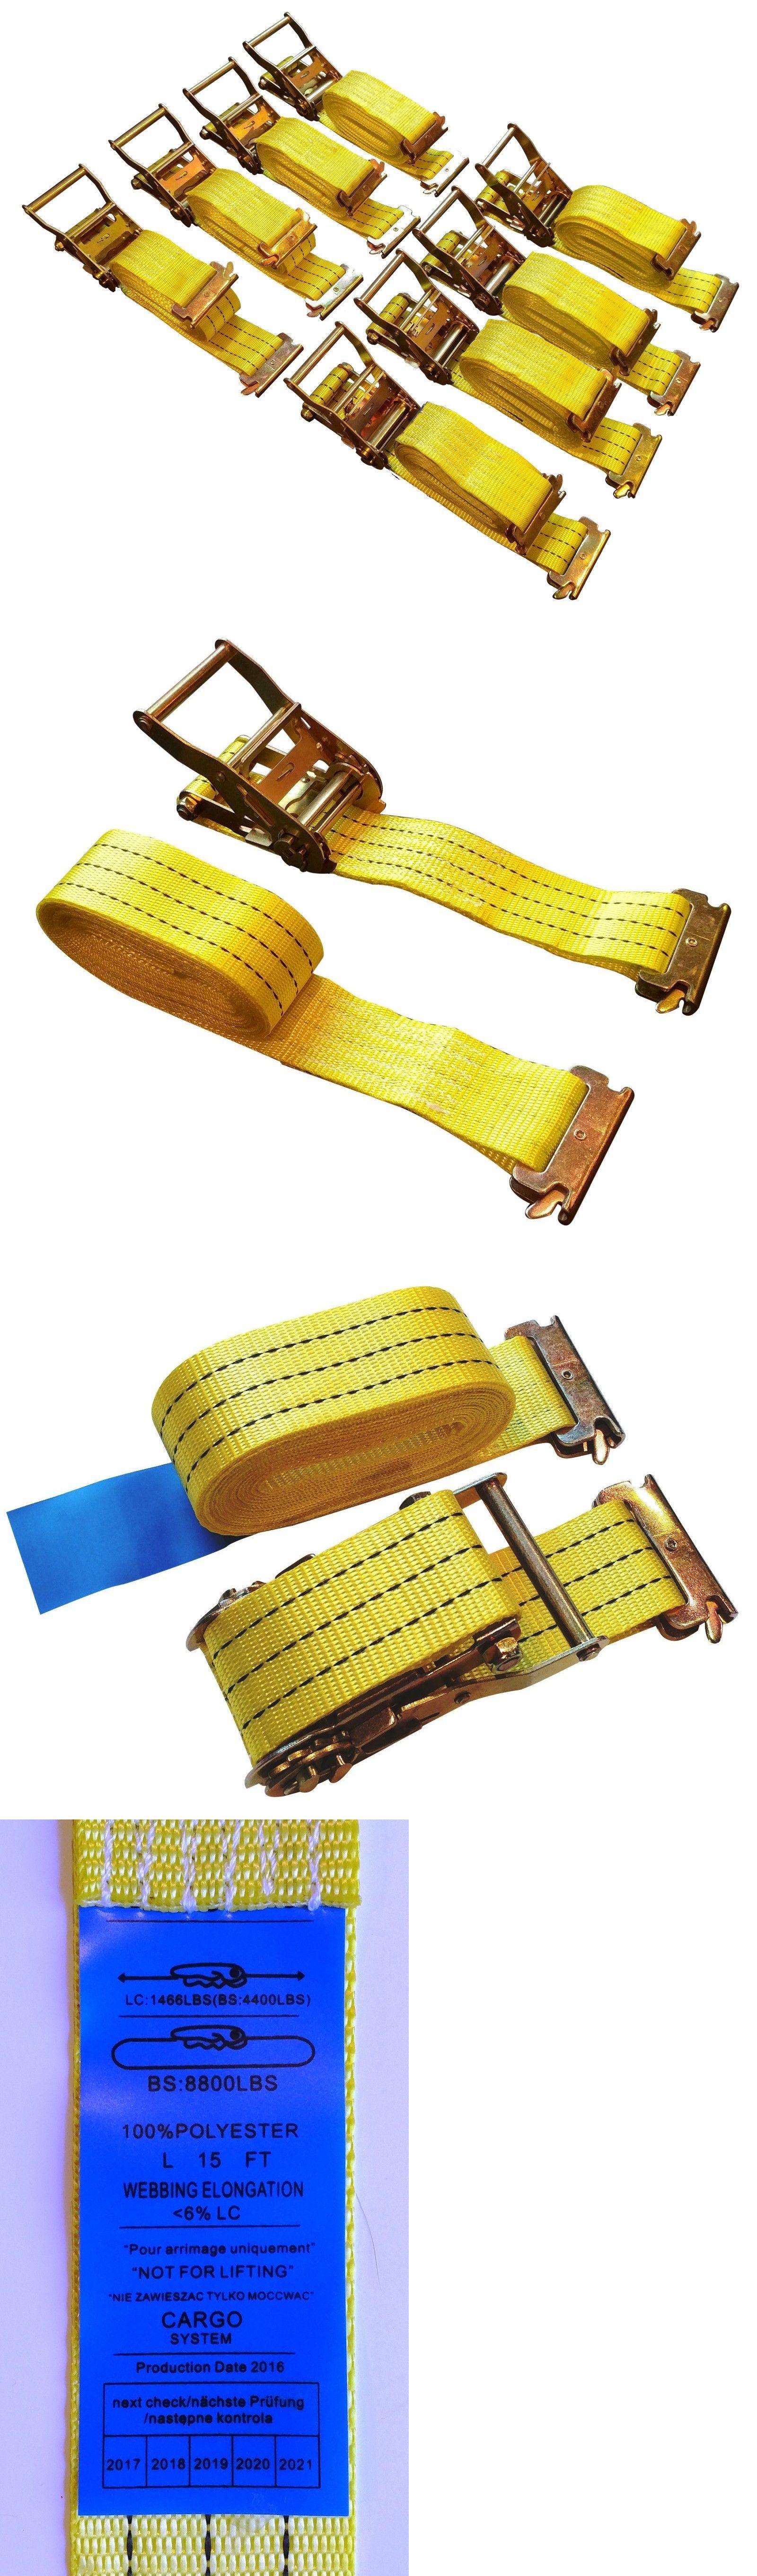 2 Pair 16ft E-TRACK RATCHET STRAP SET OF 4 each